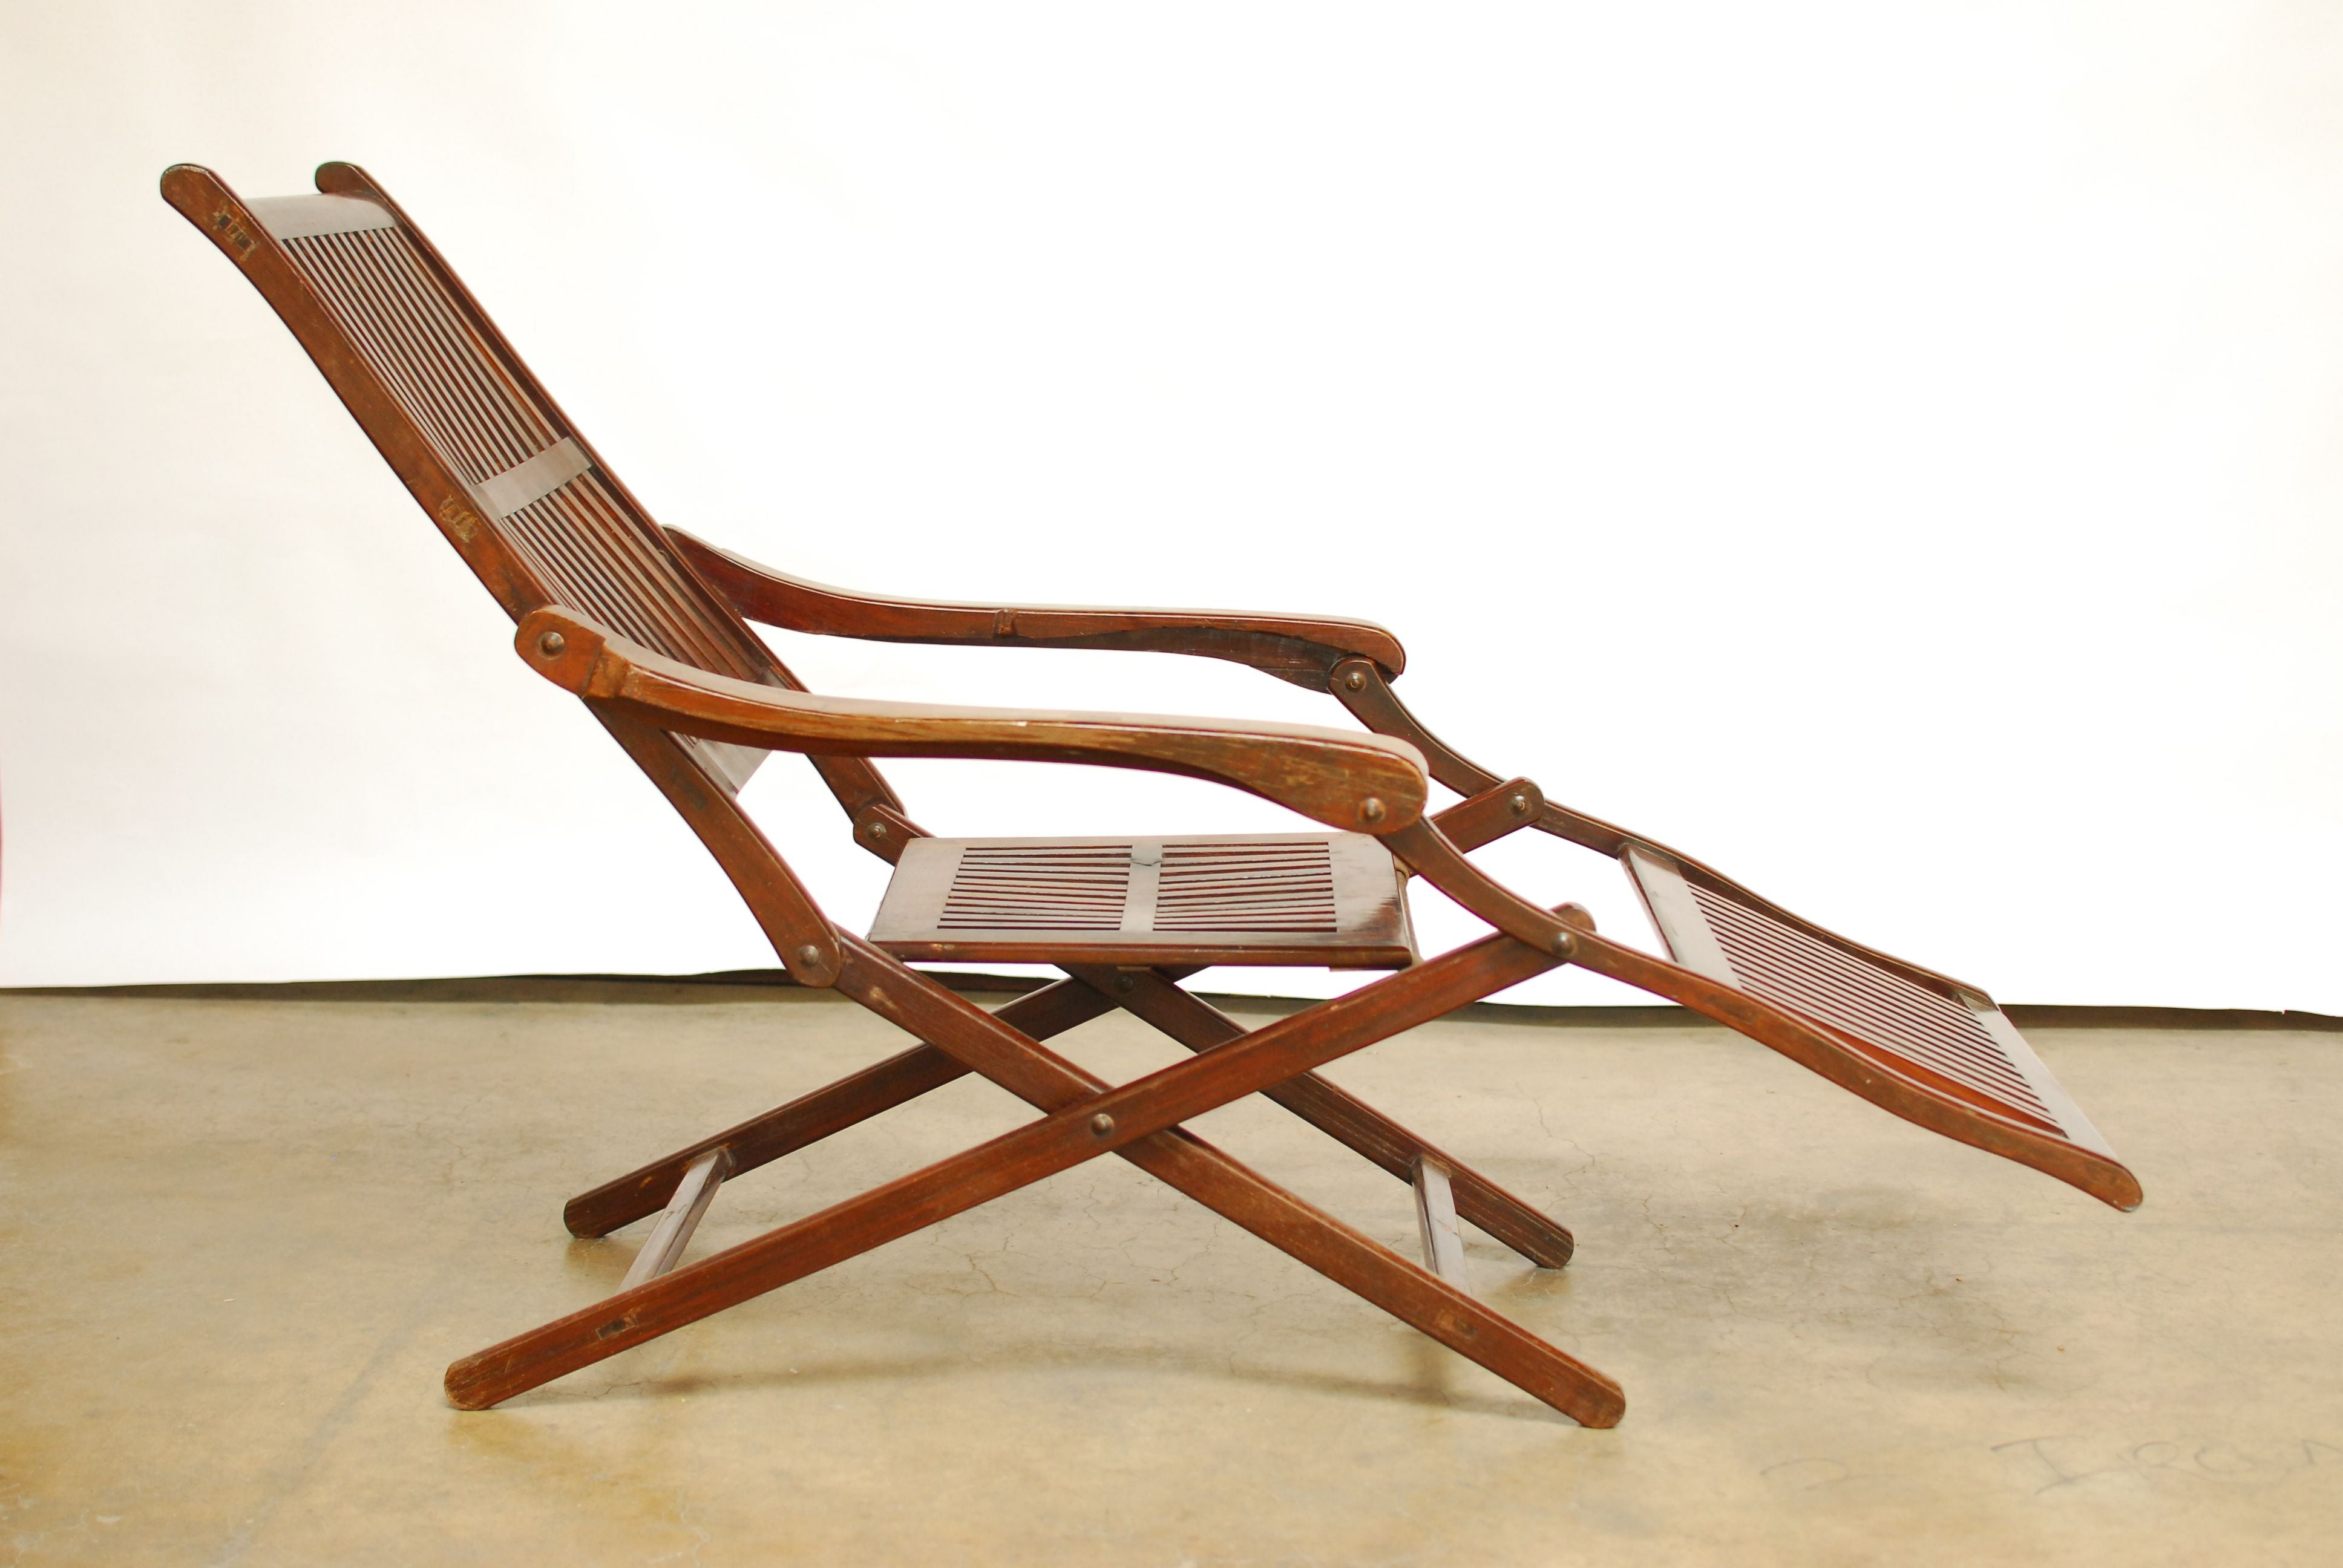 Prime Antique Ocean Steamer Deck Chair At 1Stdibs Theyellowbook Wood Chair Design Ideas Theyellowbookinfo